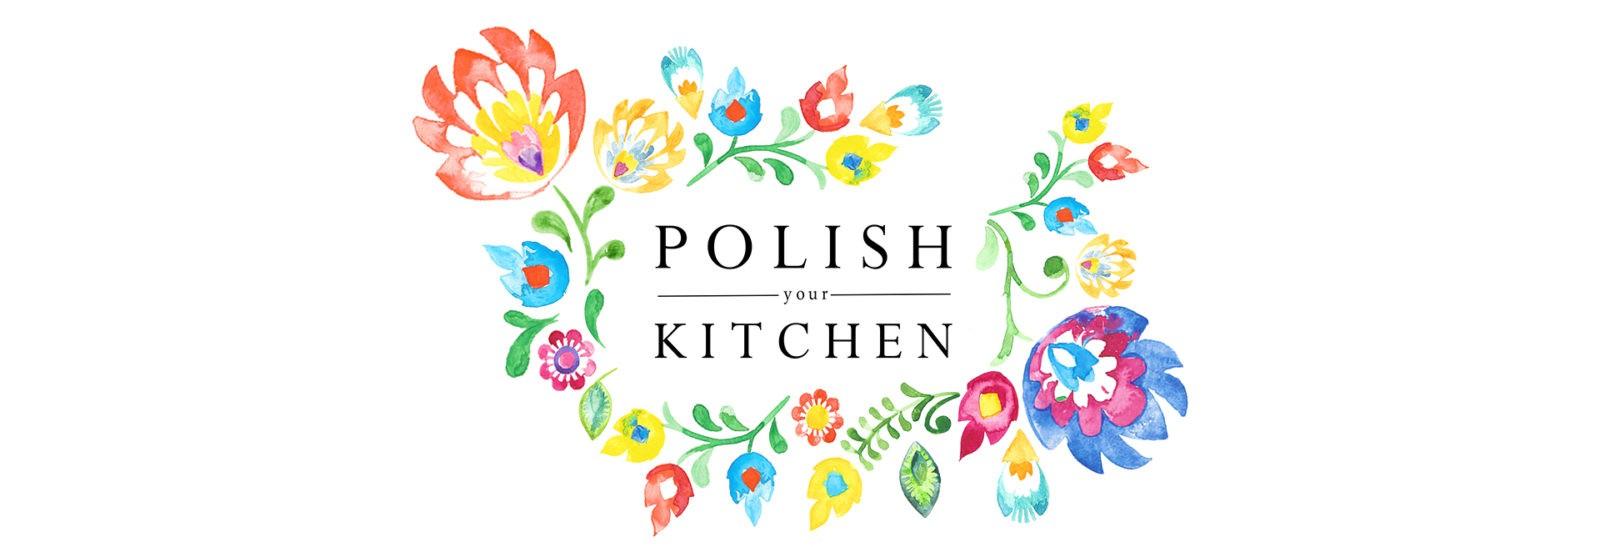 Polish Your Kitchen